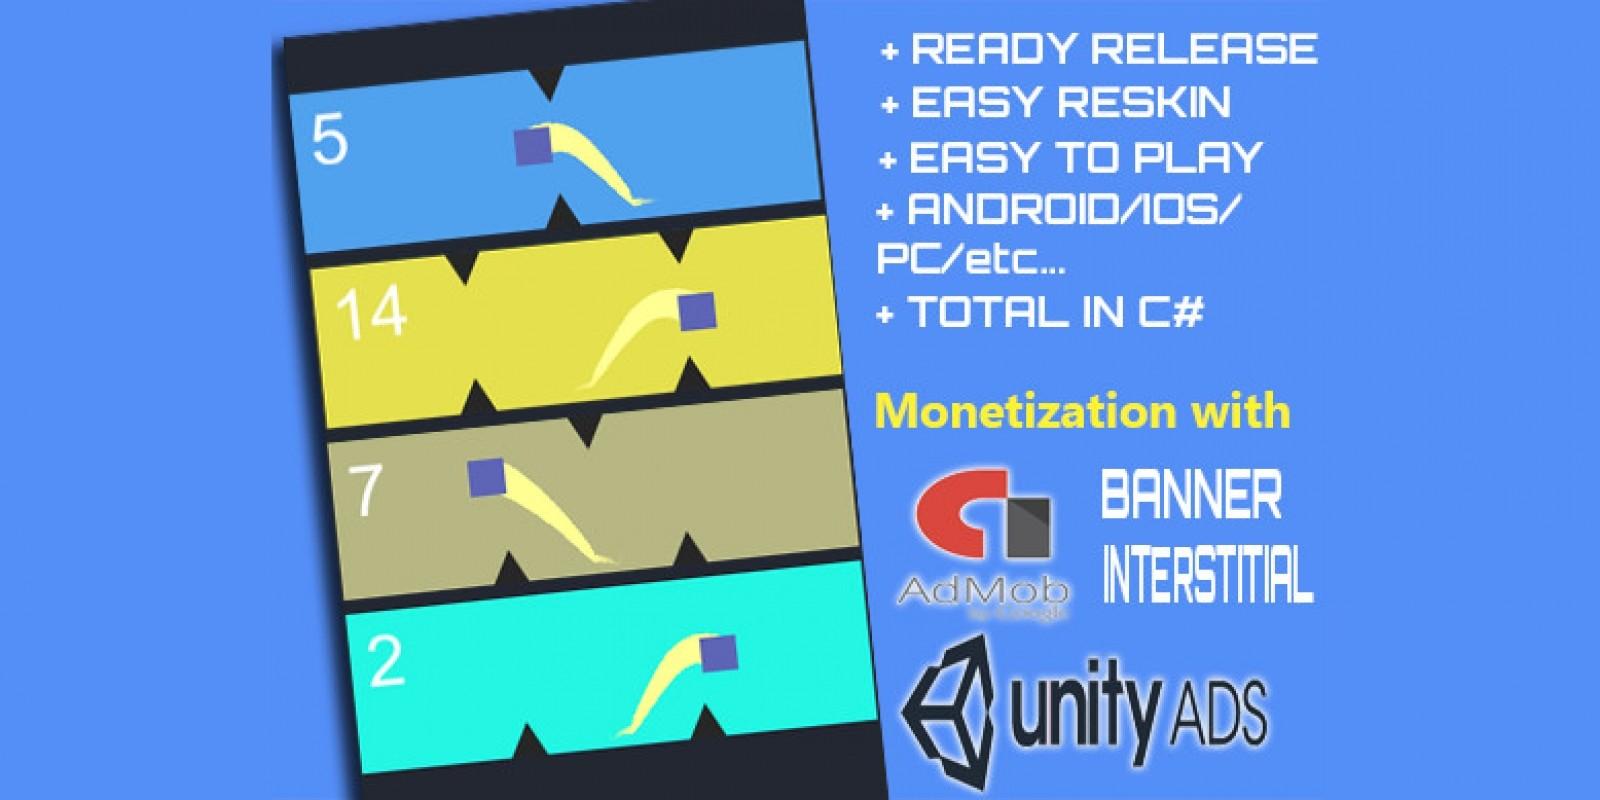 Run Floor - Complete Unity Game